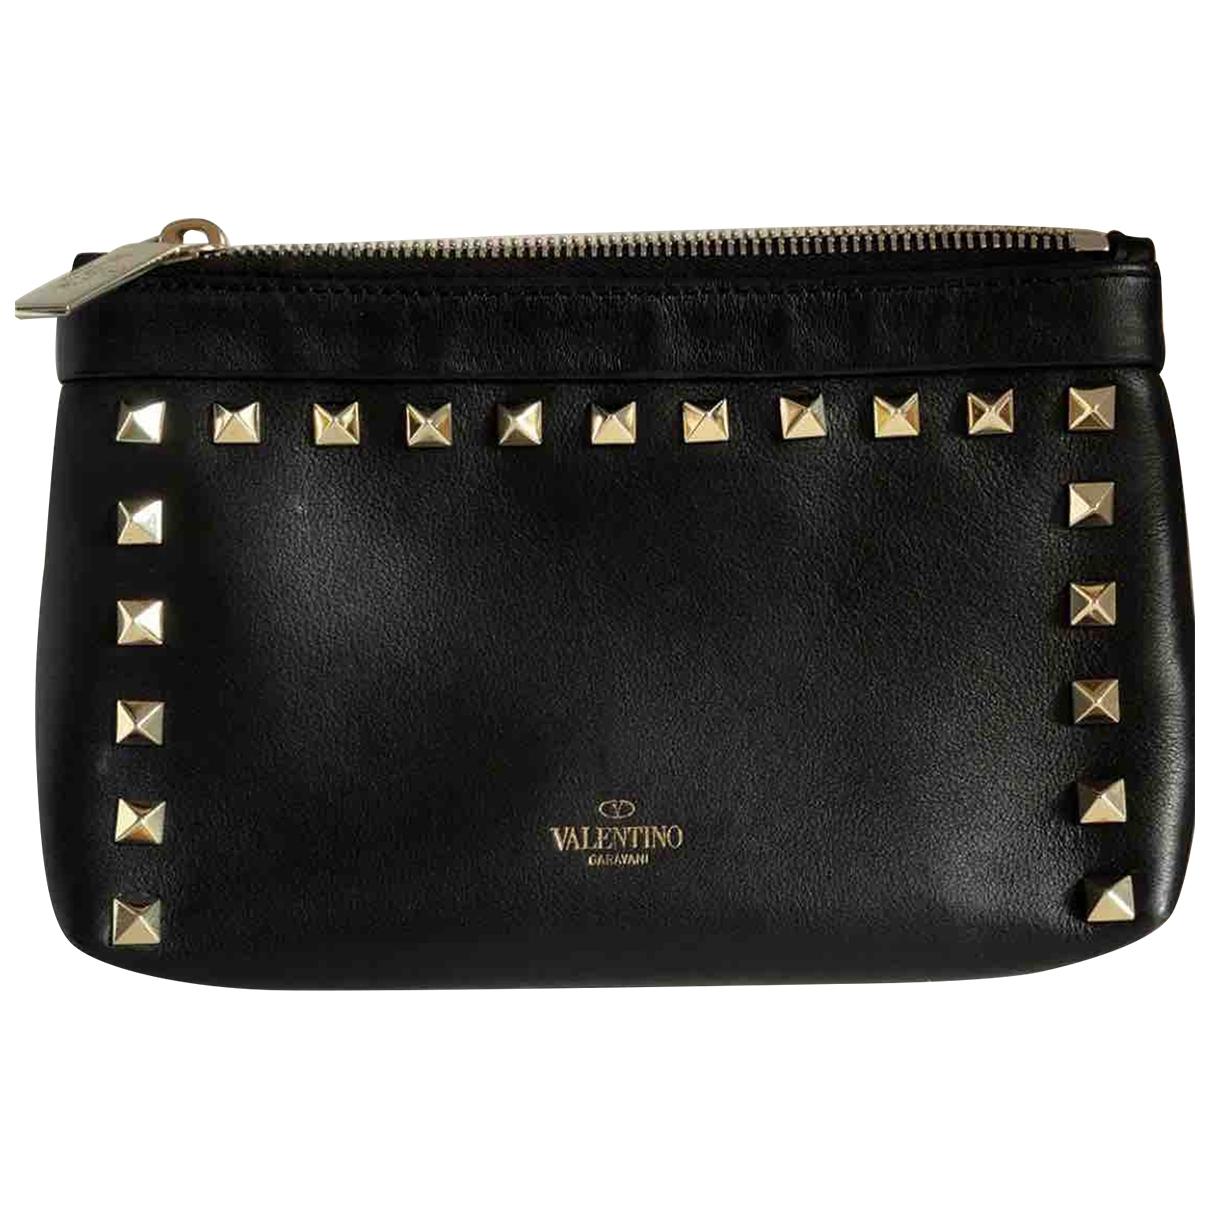 Valentino Garavani \N Black Leather Purses, wallet & cases for Women \N